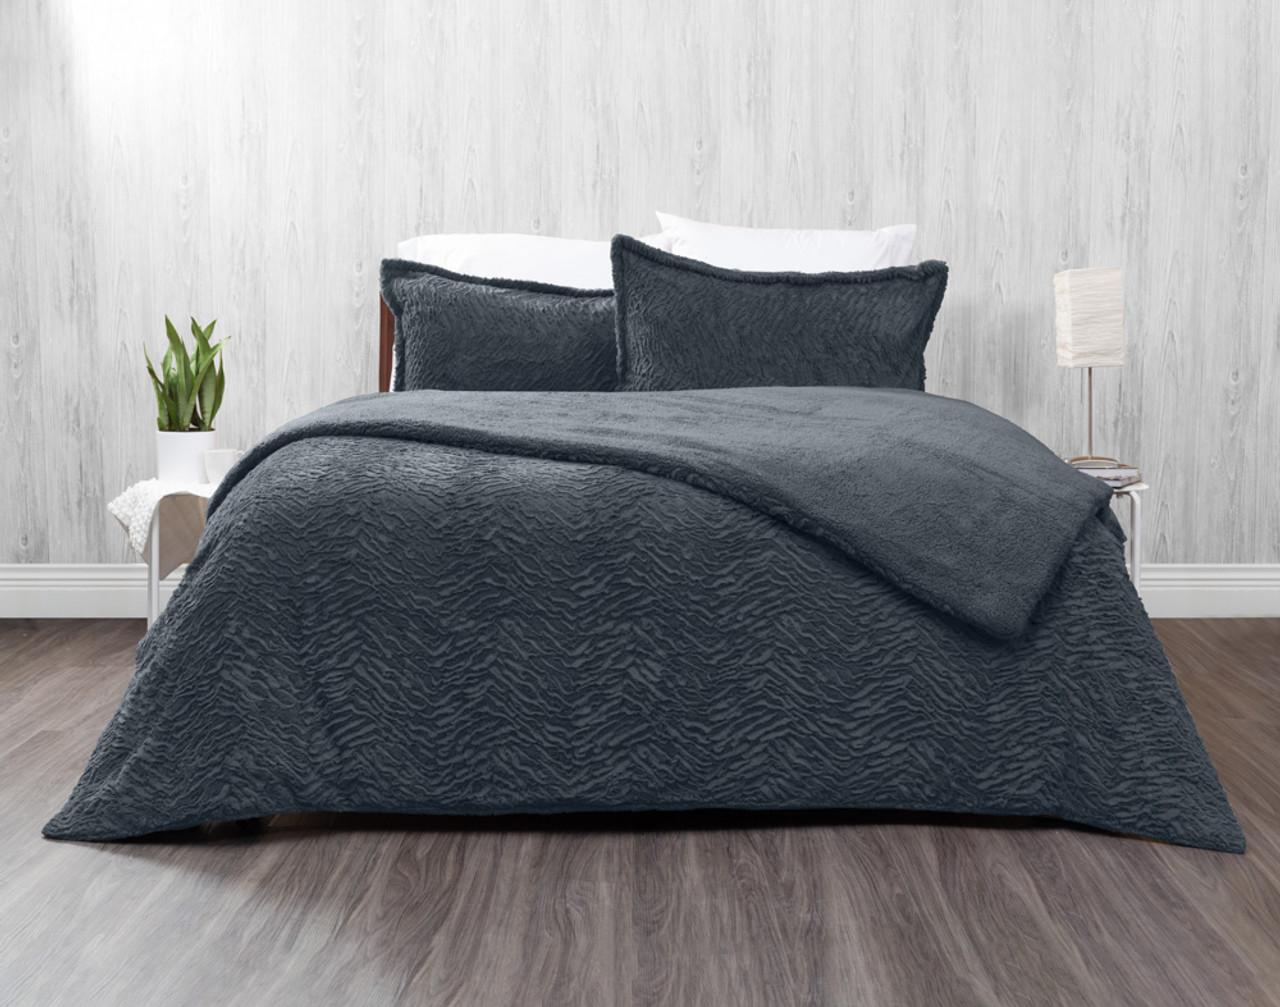 Faux Rabbit Plush Comforter Set in Thundercloud, a dark grey.